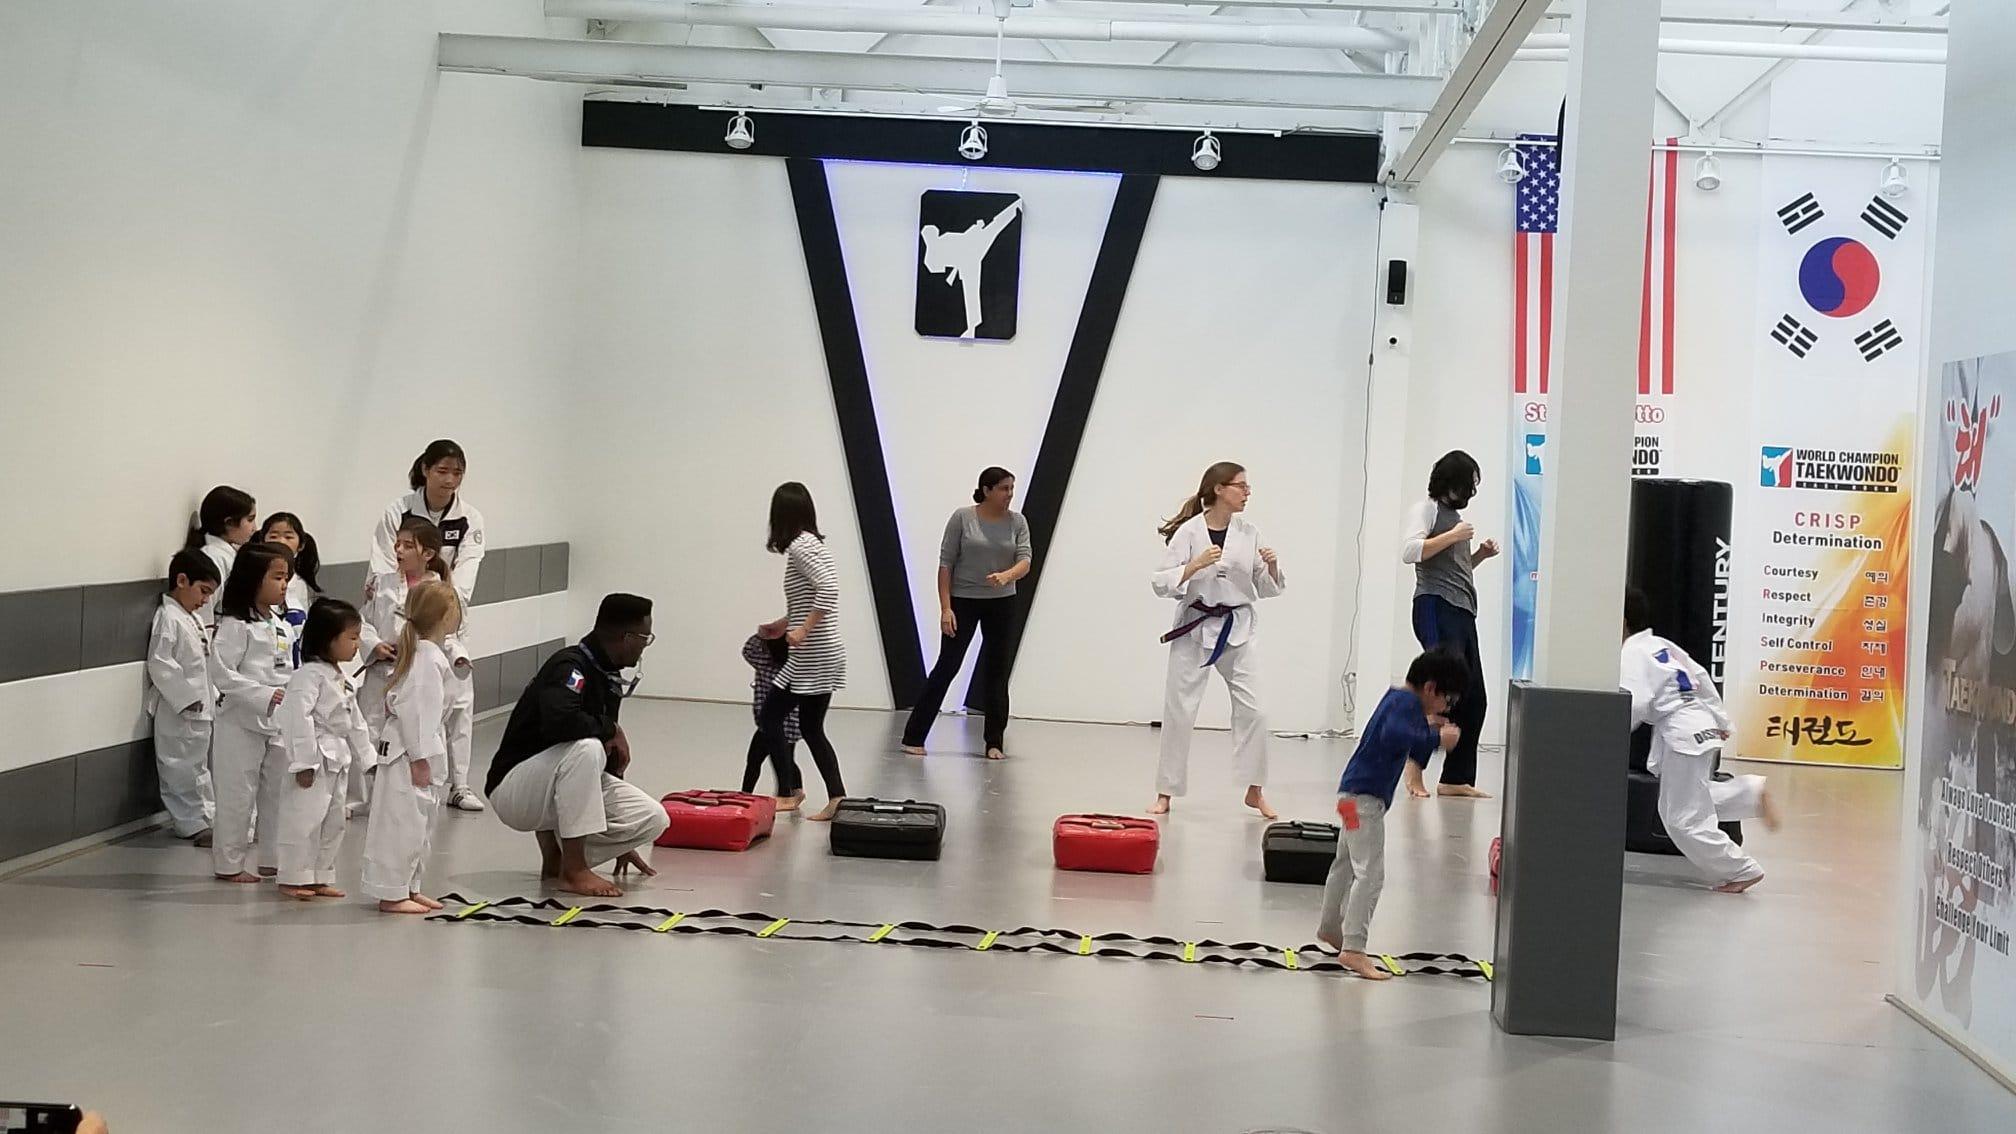 World Champion Taekwondo Gallery Photo Number 4